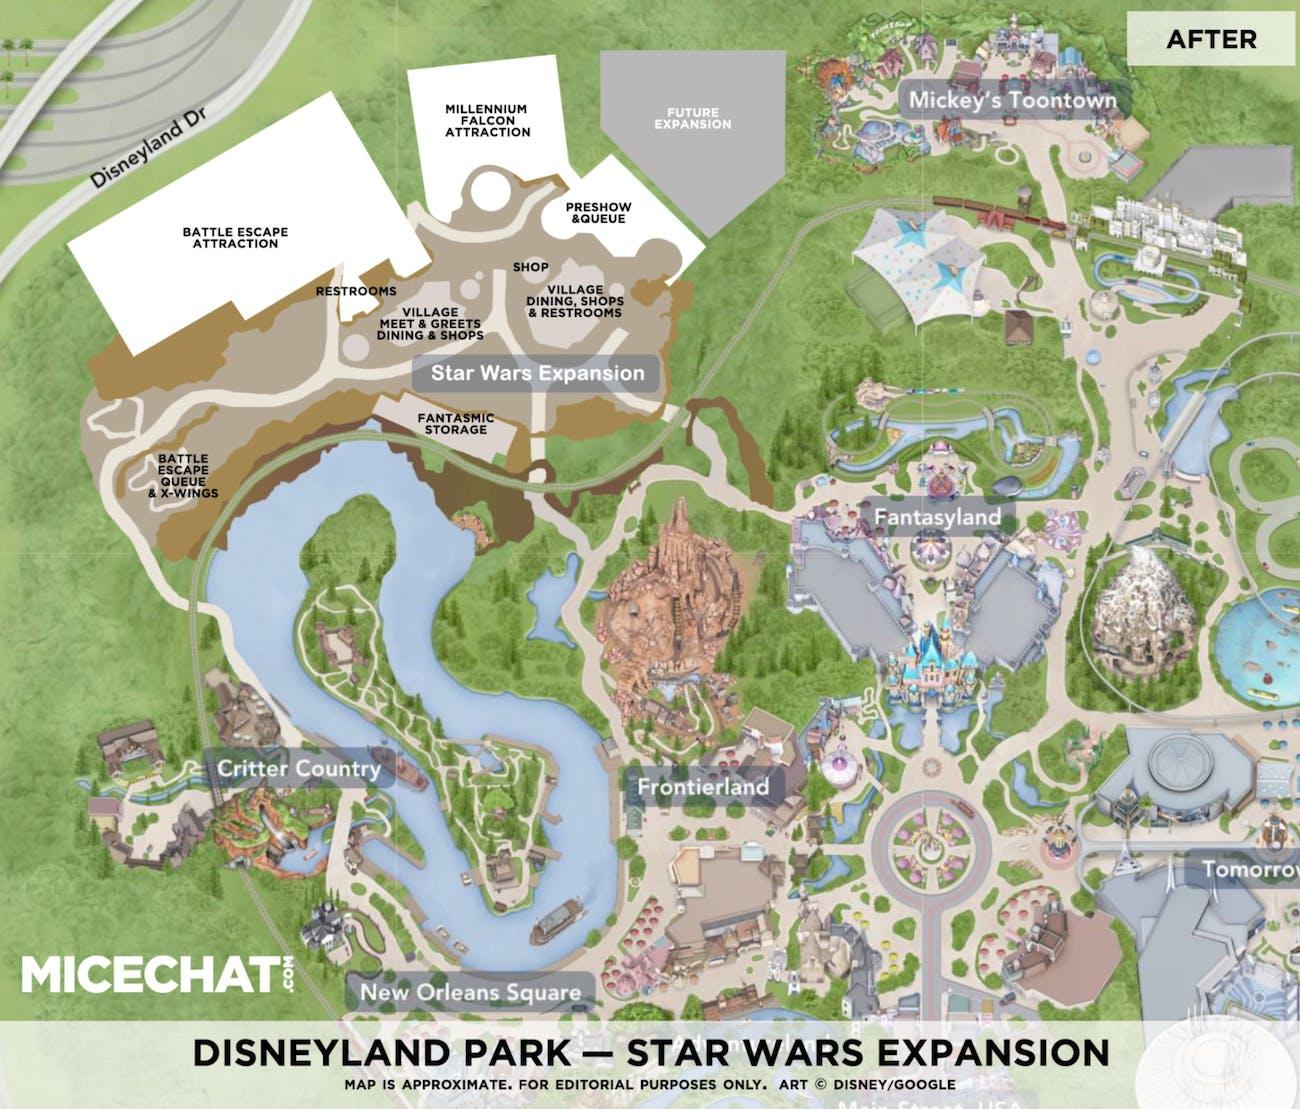 Star Wars Land Disney World Map Time Zones Map: Star Wars Disney World Map